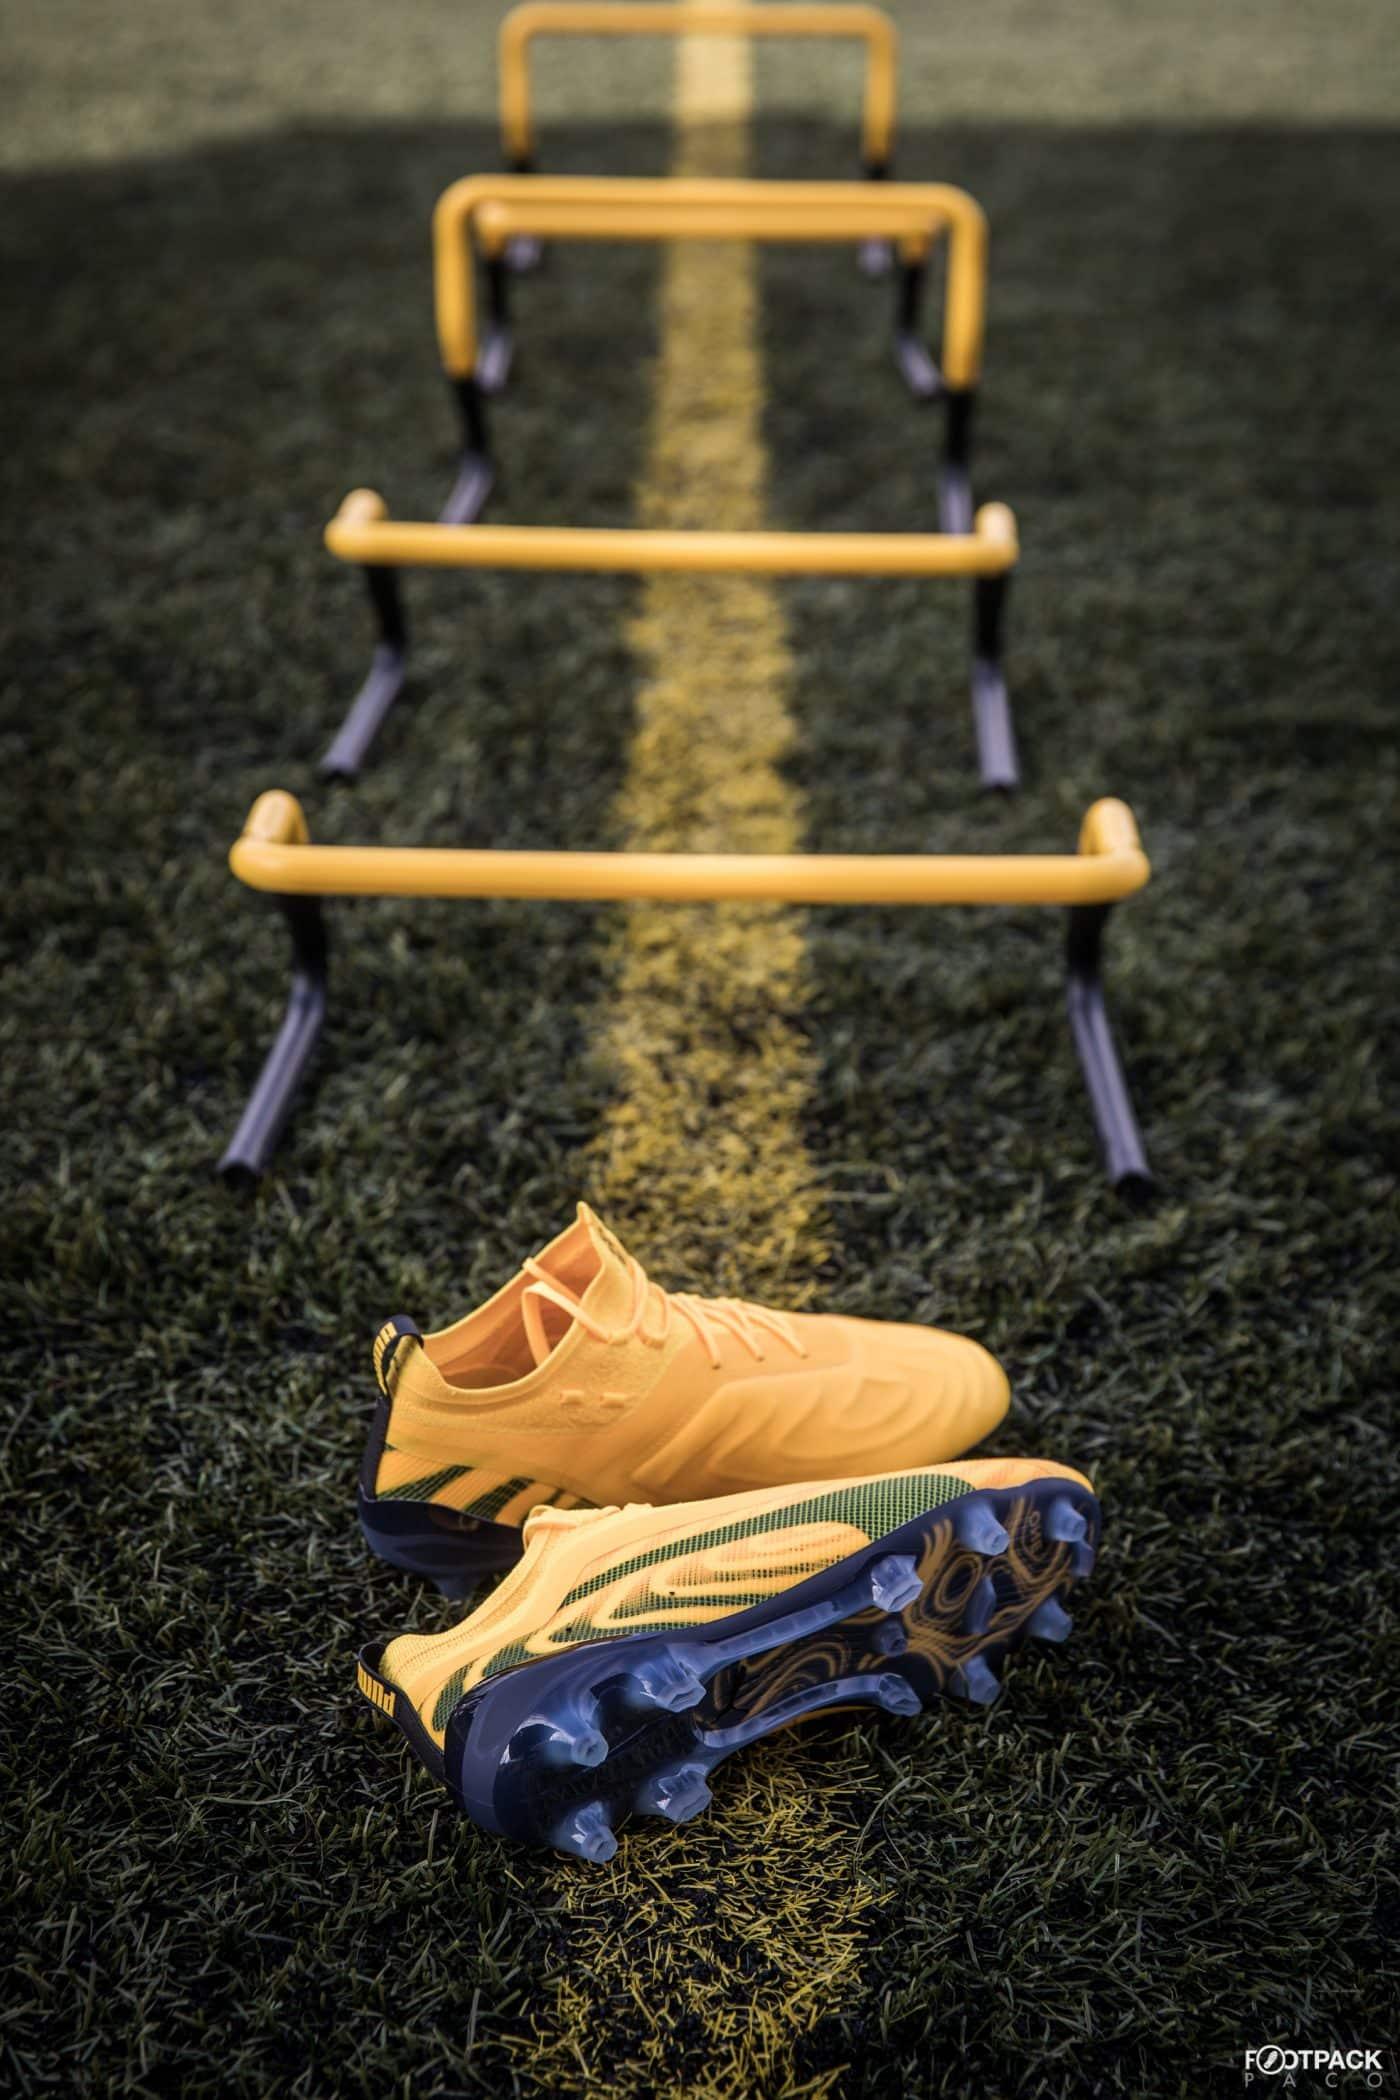 chaussures-de-foot-puma-one-5.1-spark-janvier-2020-footpack-6